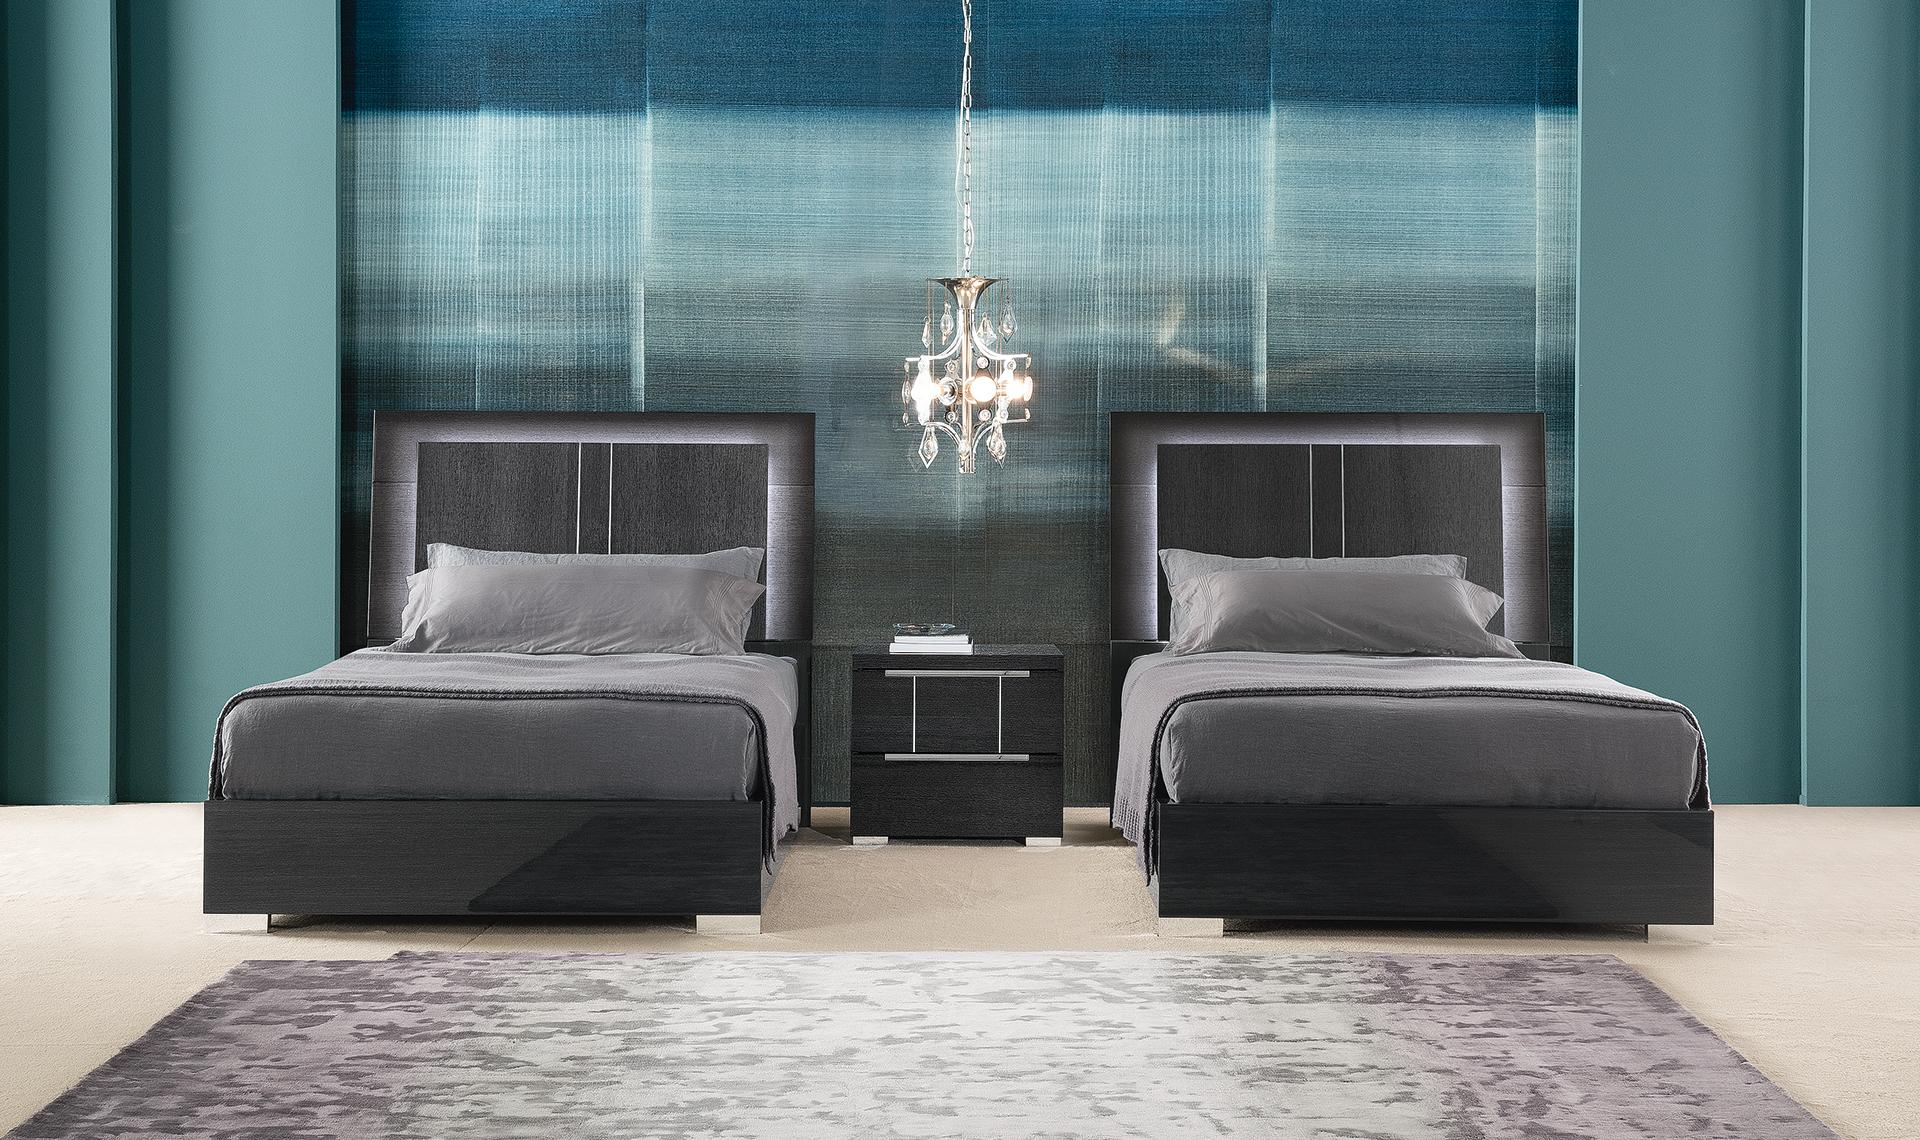 Versilia Bedroom - 2 Full Size Beds